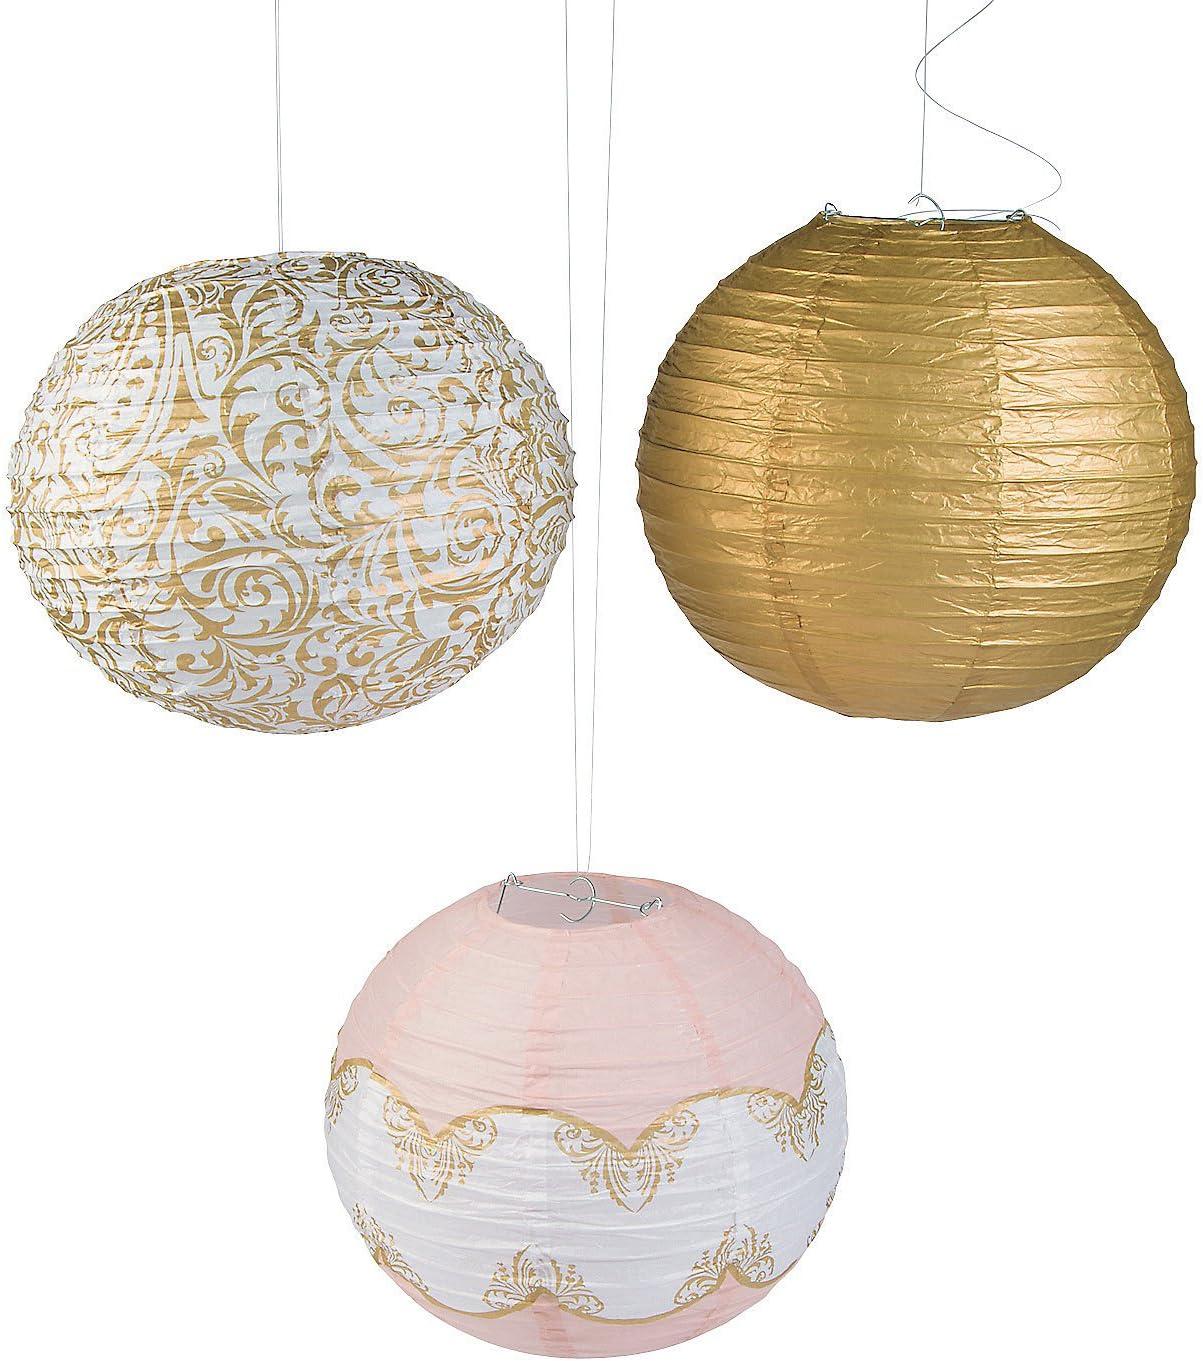 Fun Express - Fairytale Wedding Paper Lantern Set for Wedding - Party Decor - Hanging Decor - Lanterns - Wedding - 6 Pieces